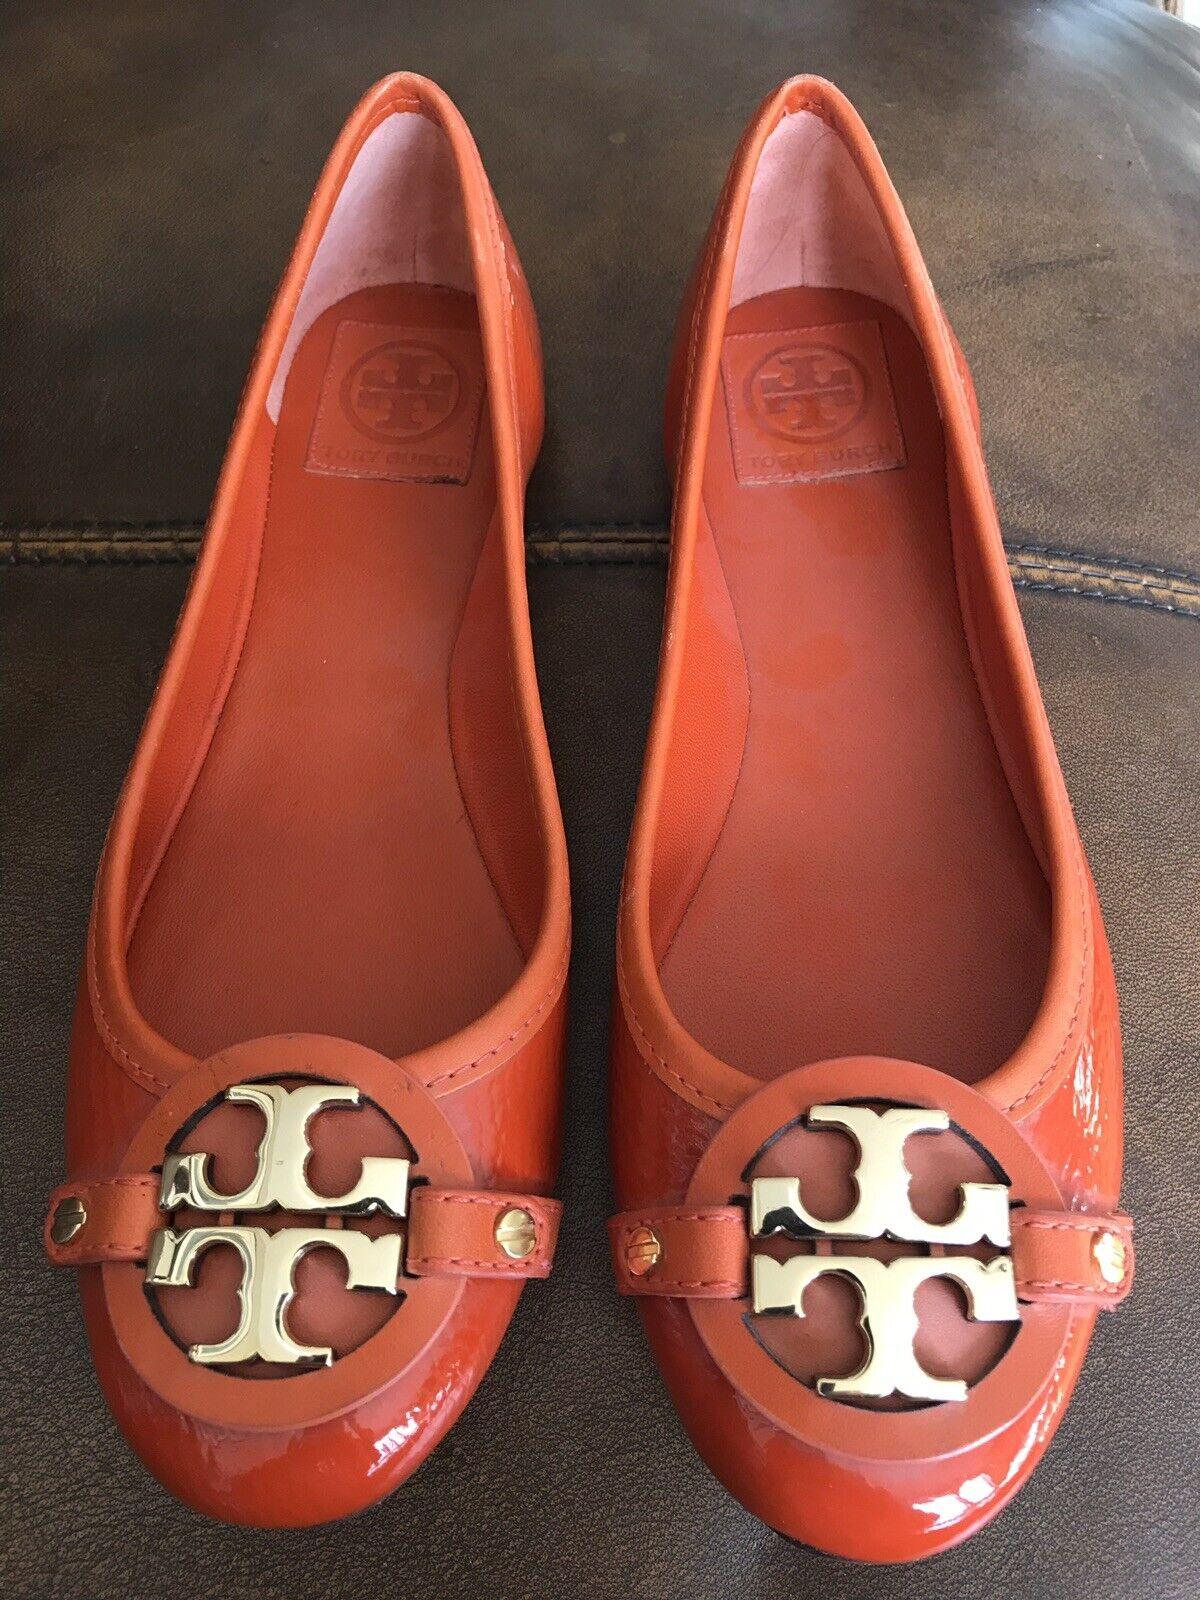 TORY BURCH Flats Ballet shoes gold orange 8.5 Women's NWT